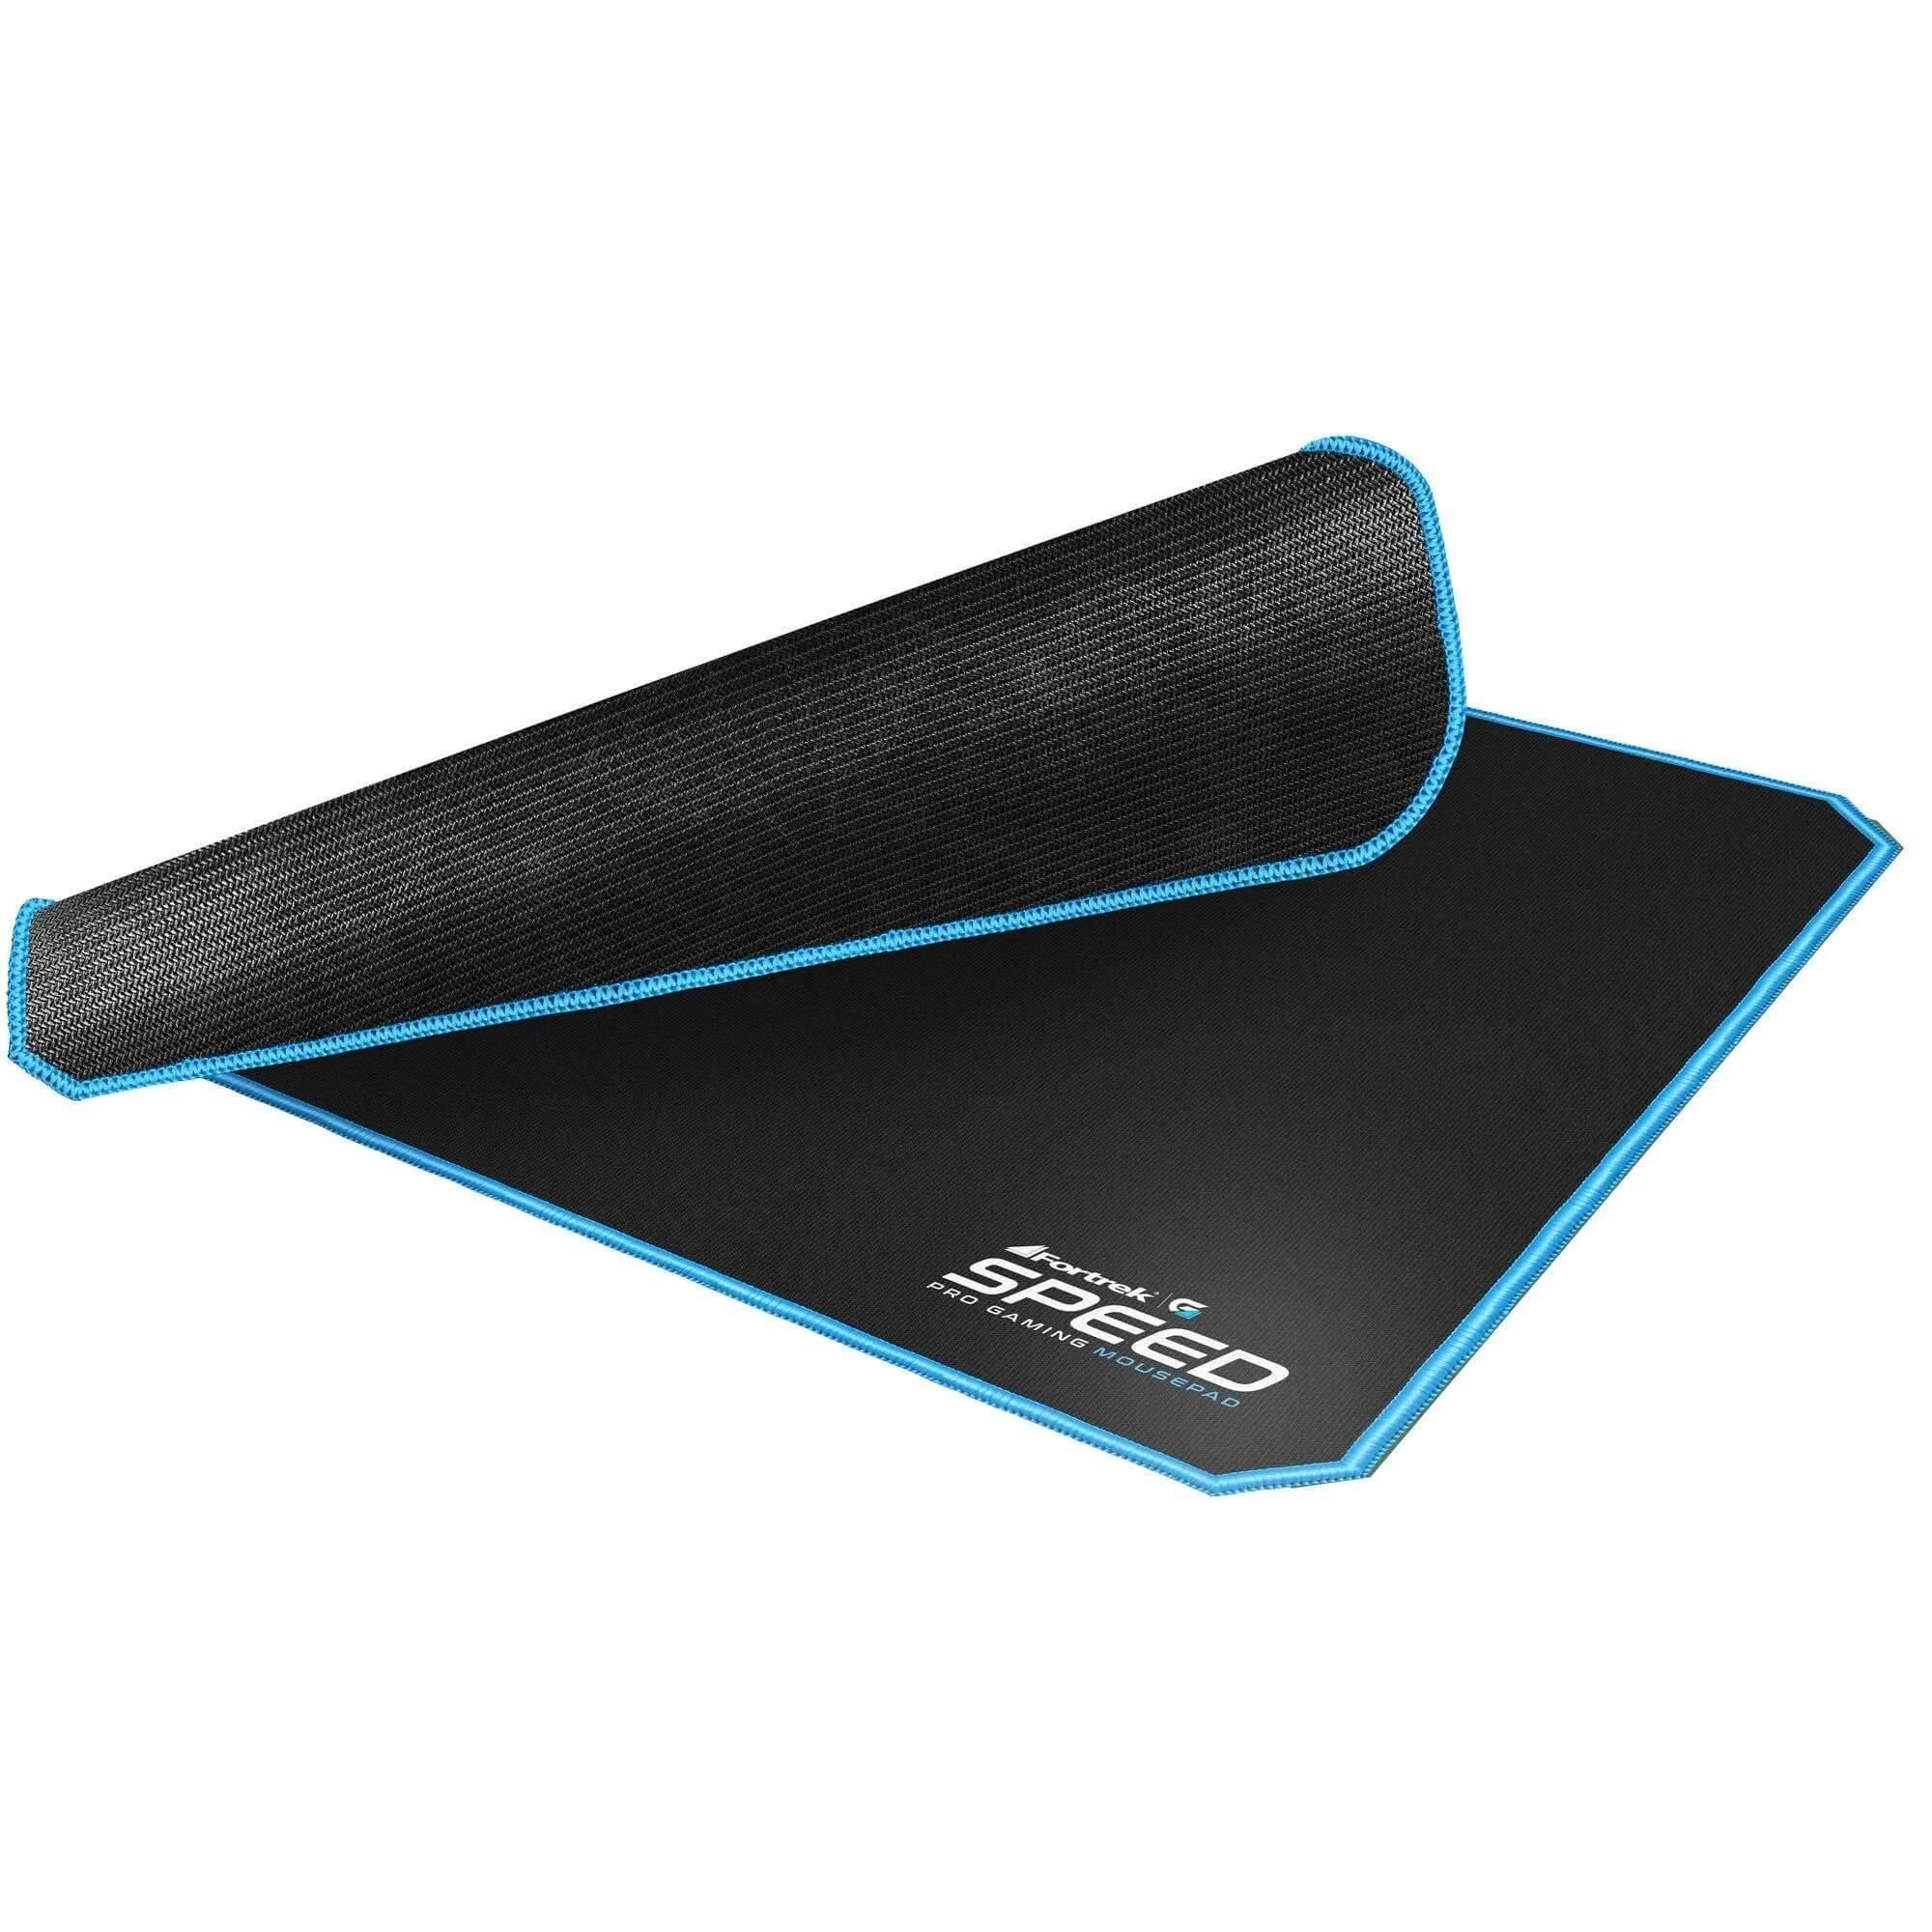 Kit Mouse Death Chroma 4800DPI + Mouse Pad 440x350mm Fortrek